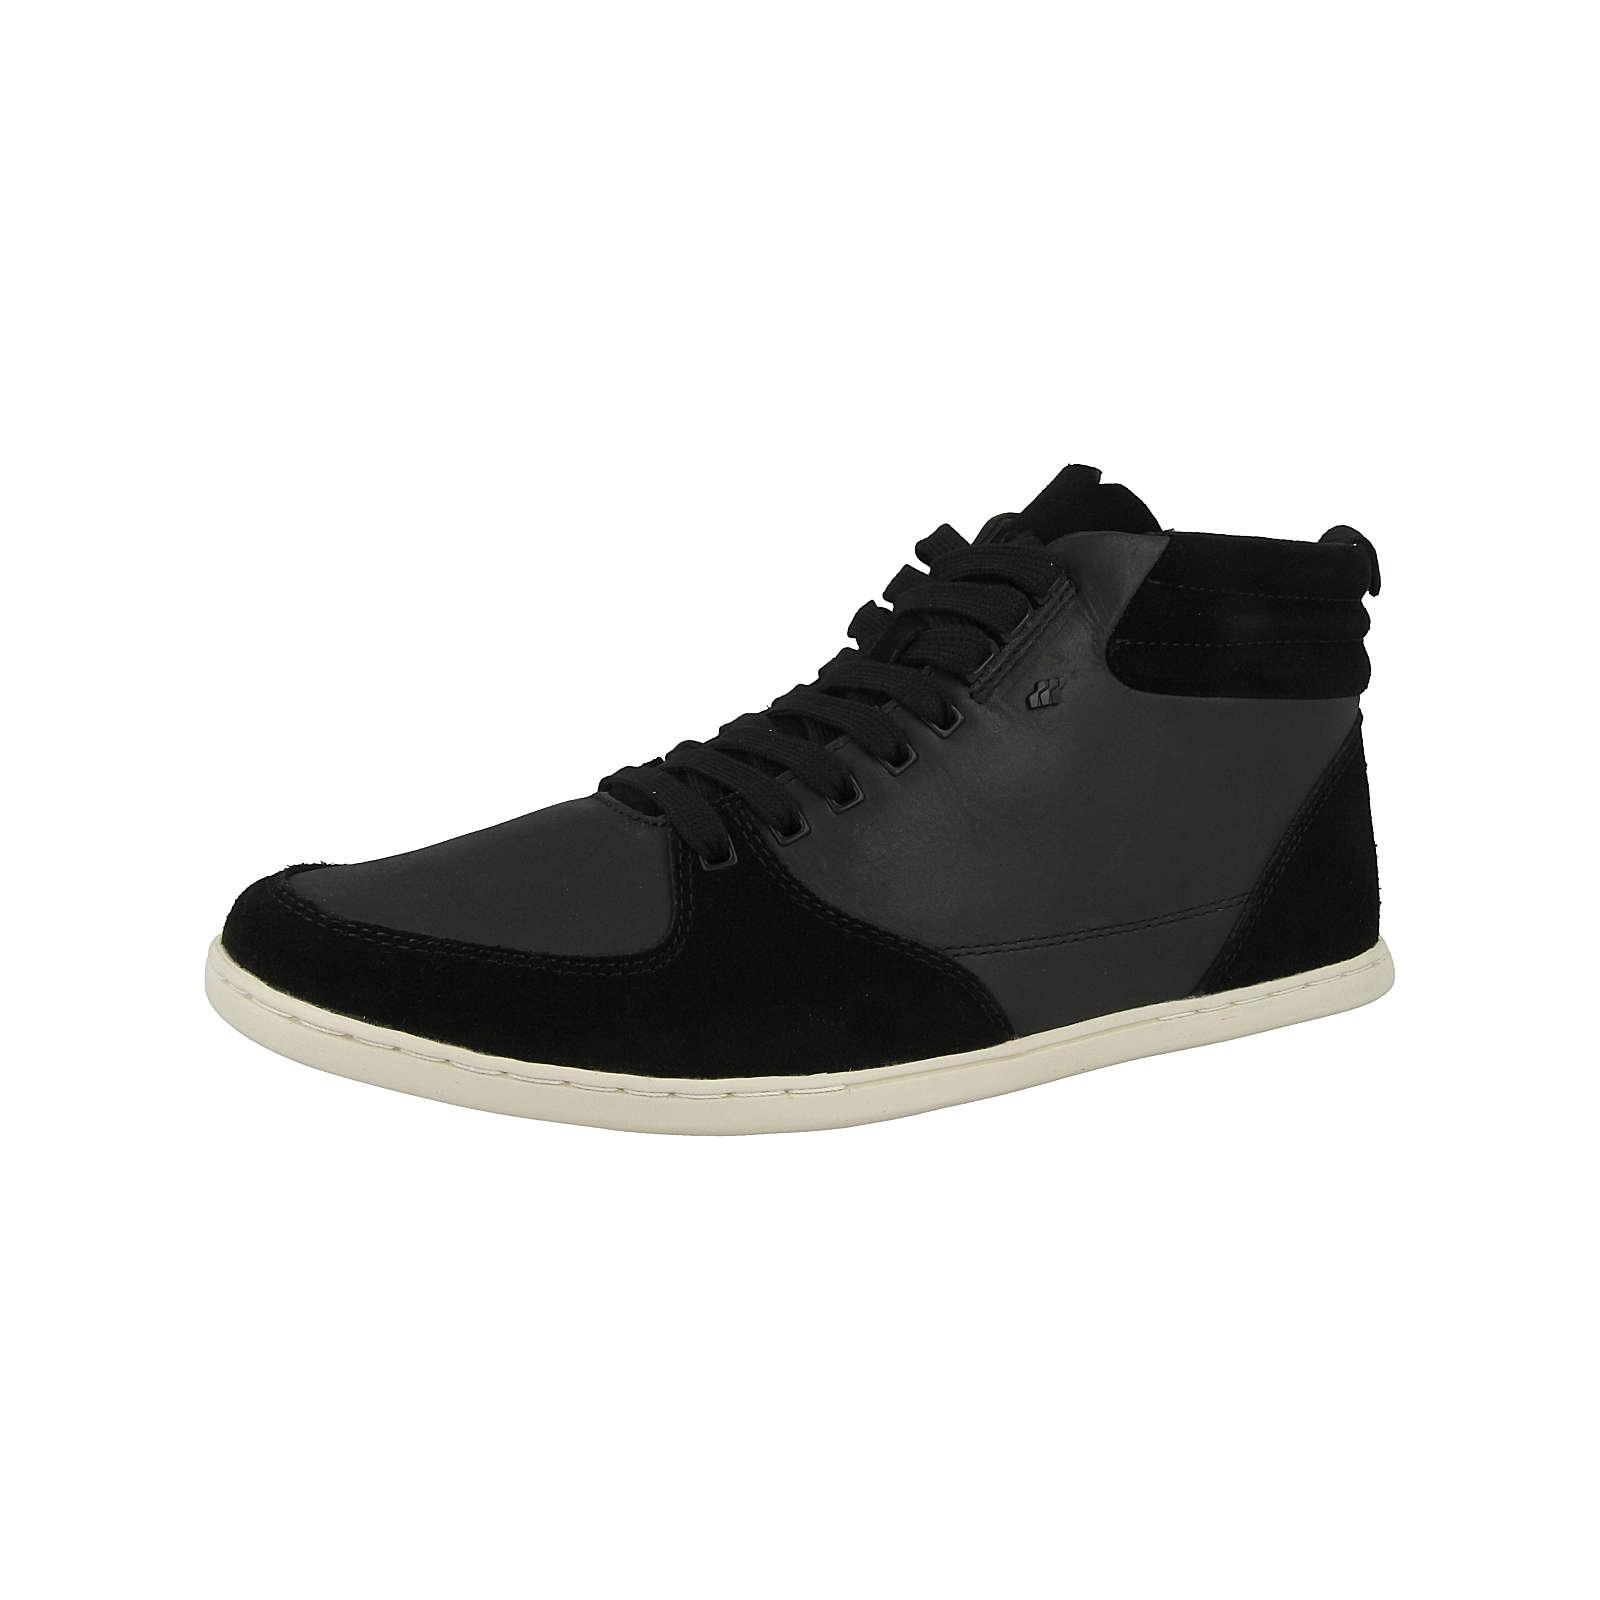 Boxfresh® Schuhe Eplett SH Leather Sneakers High schwarz Herren Gr. 47